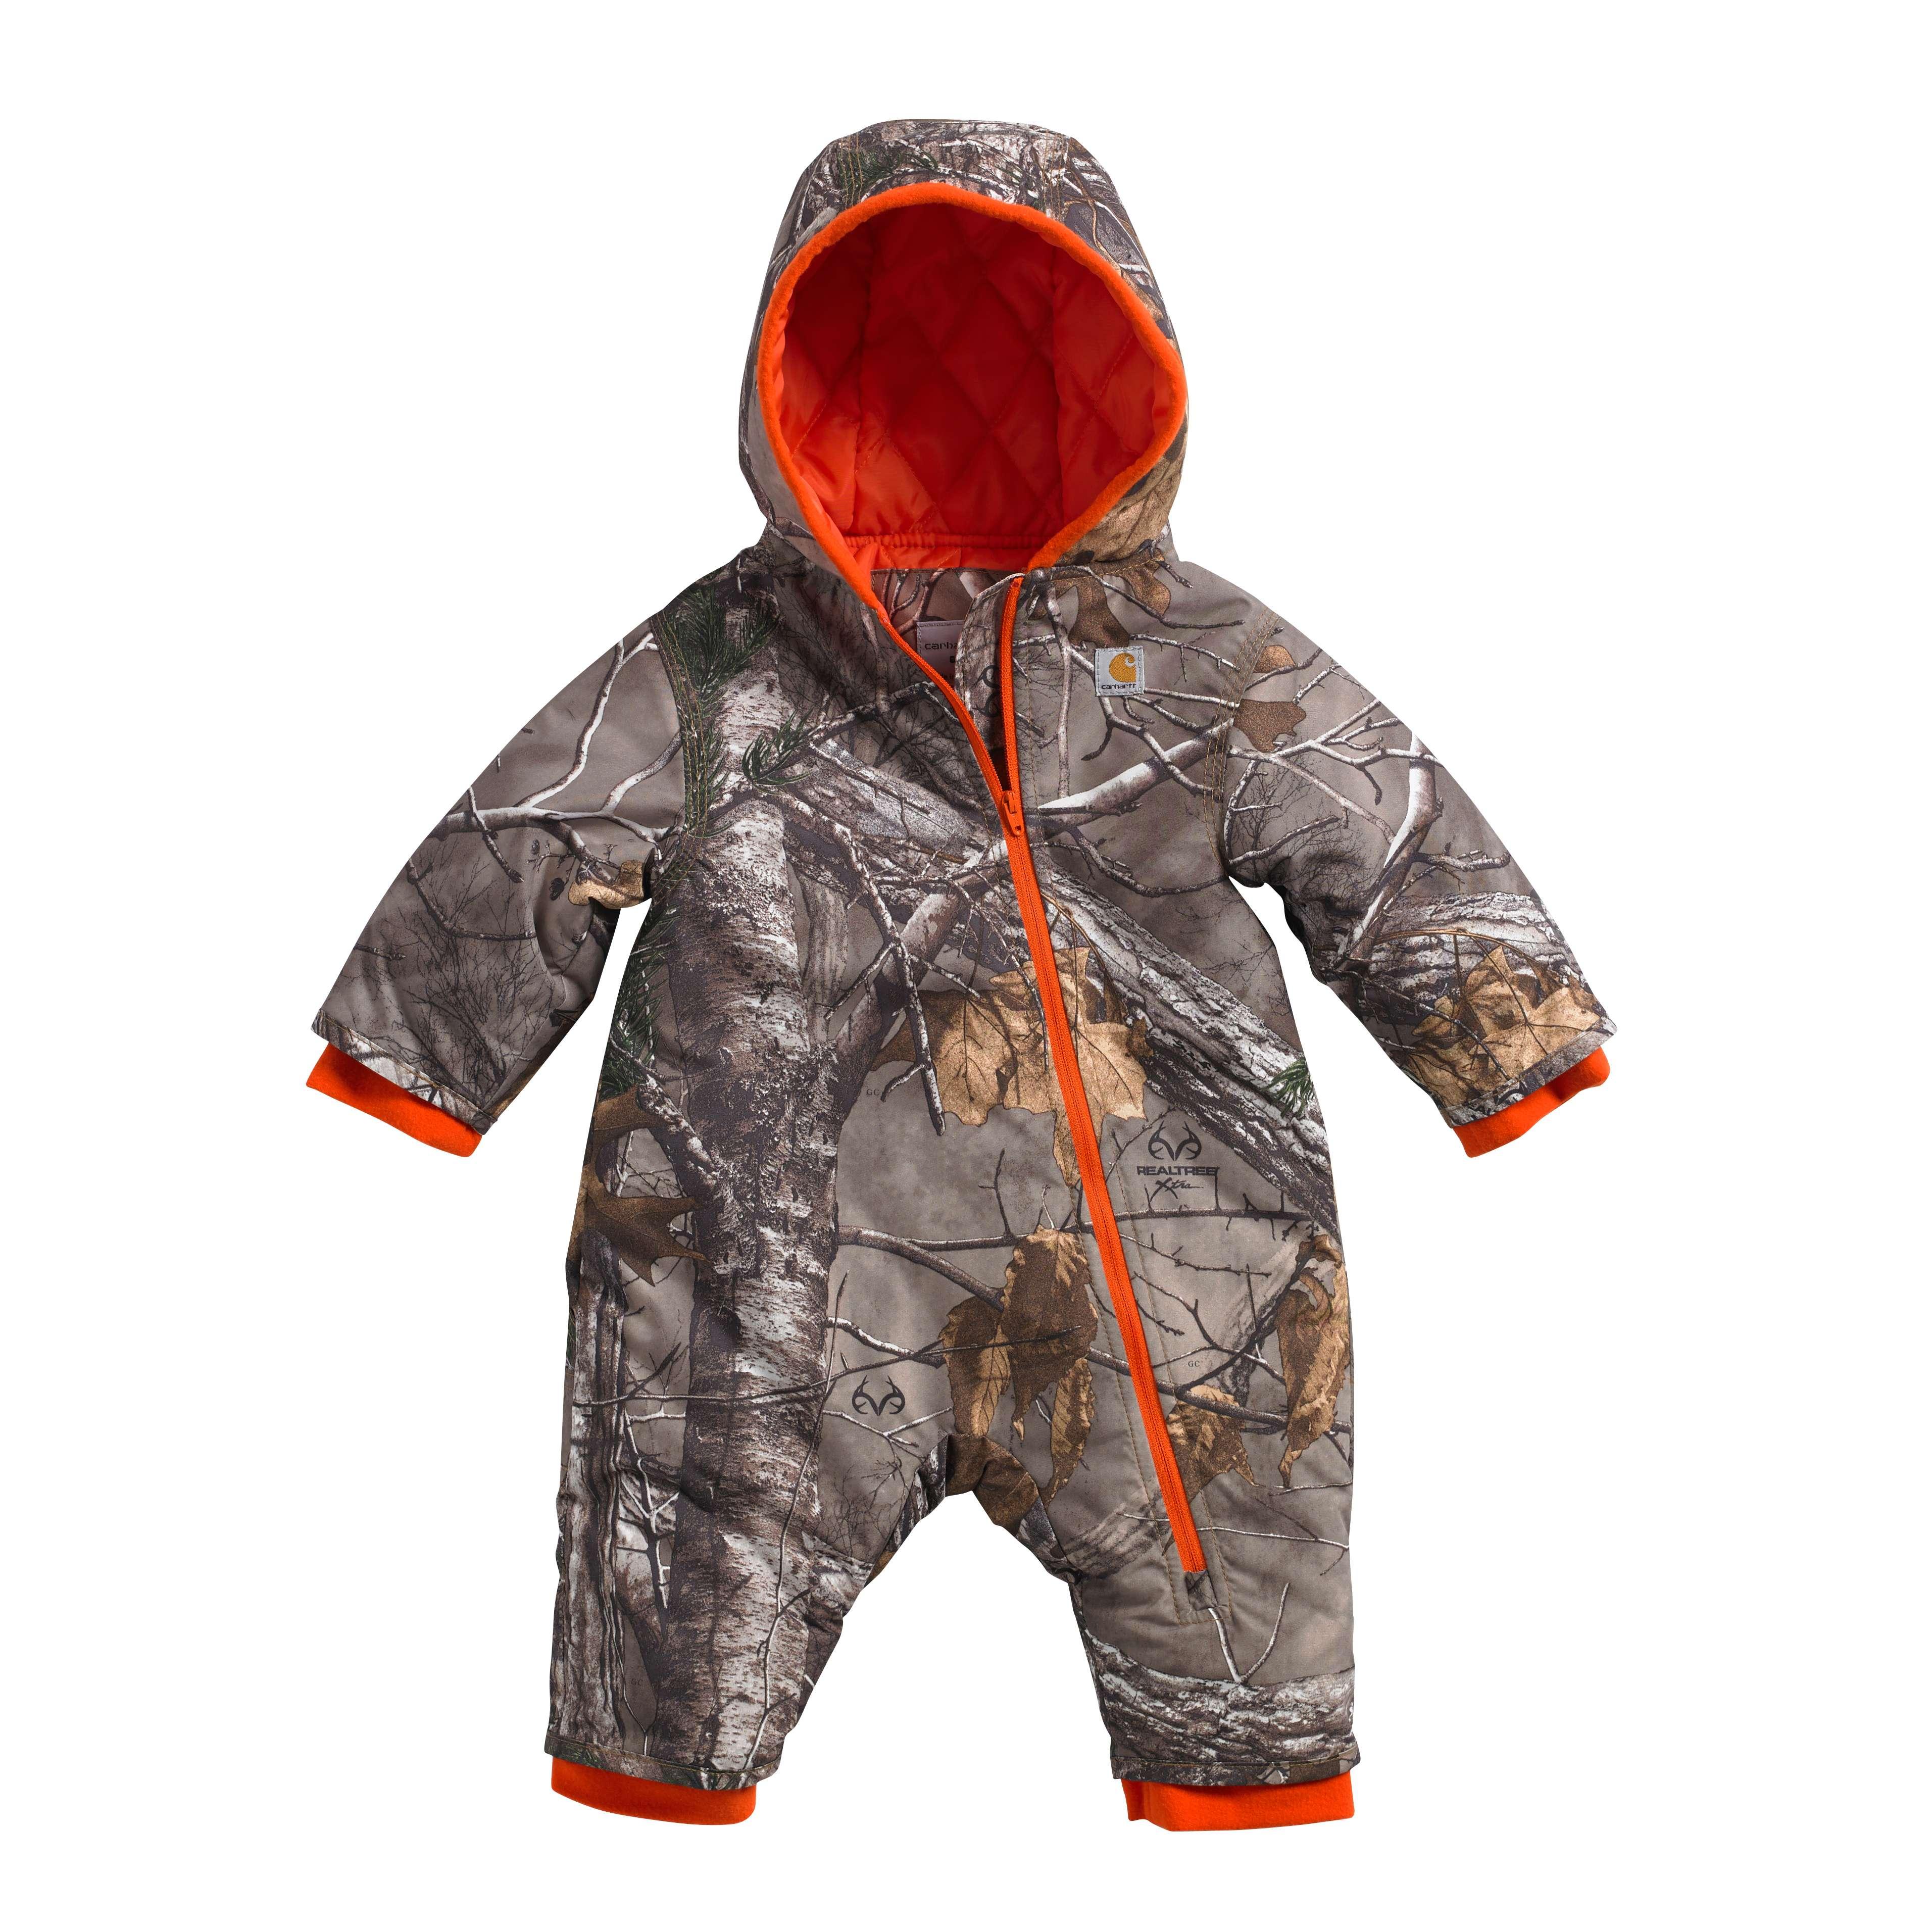 Carhartt Infant/toddler Camo Snowsuit photo